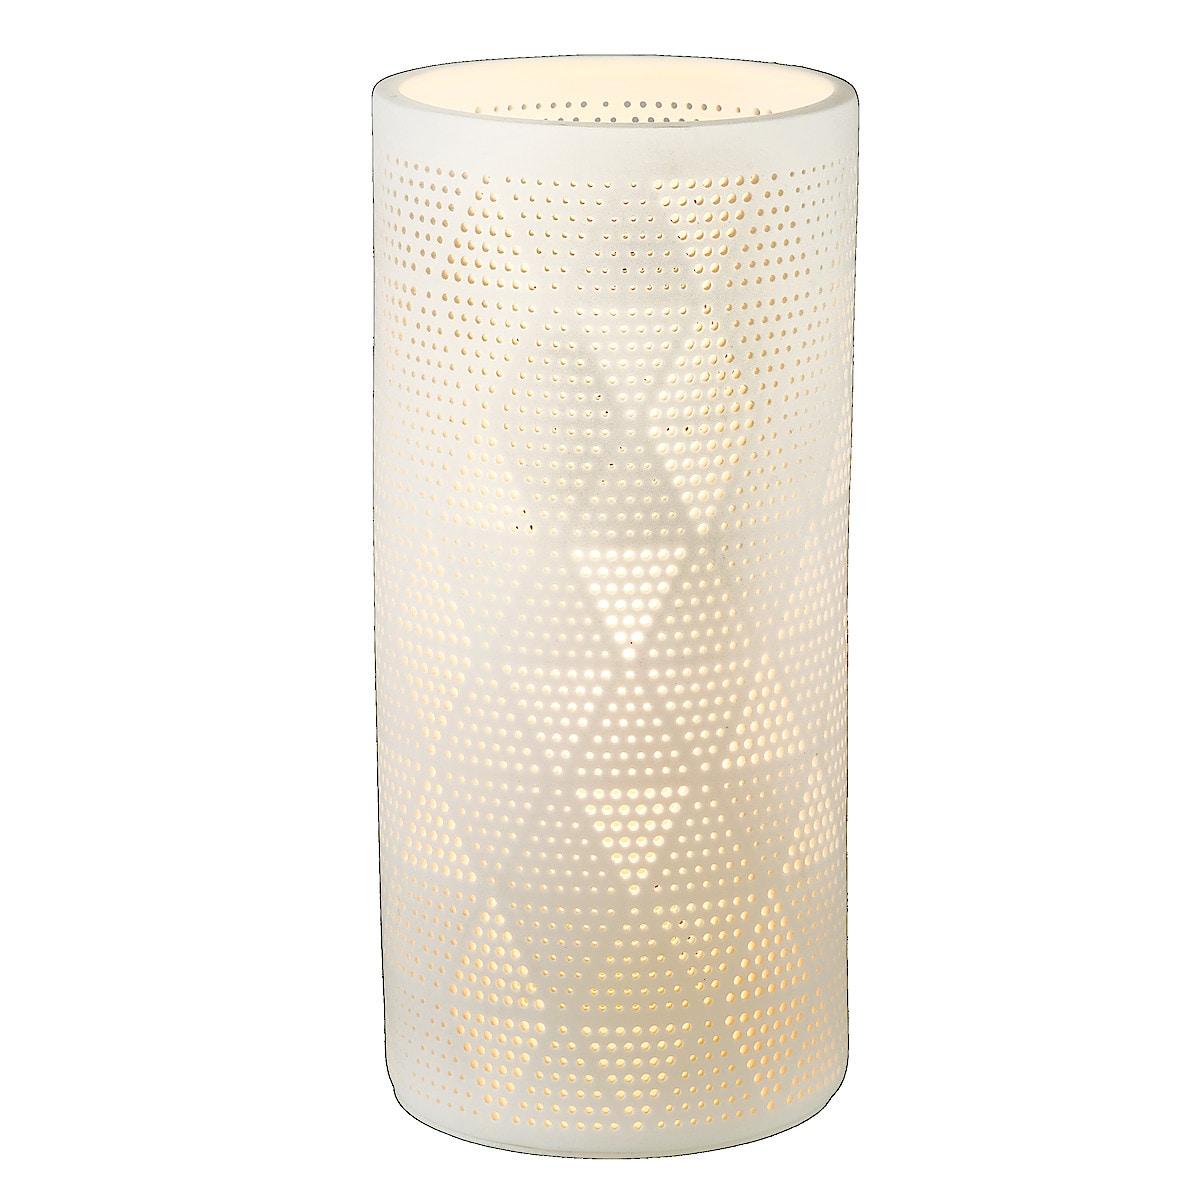 Bordslampa i porslin Tube Northlight